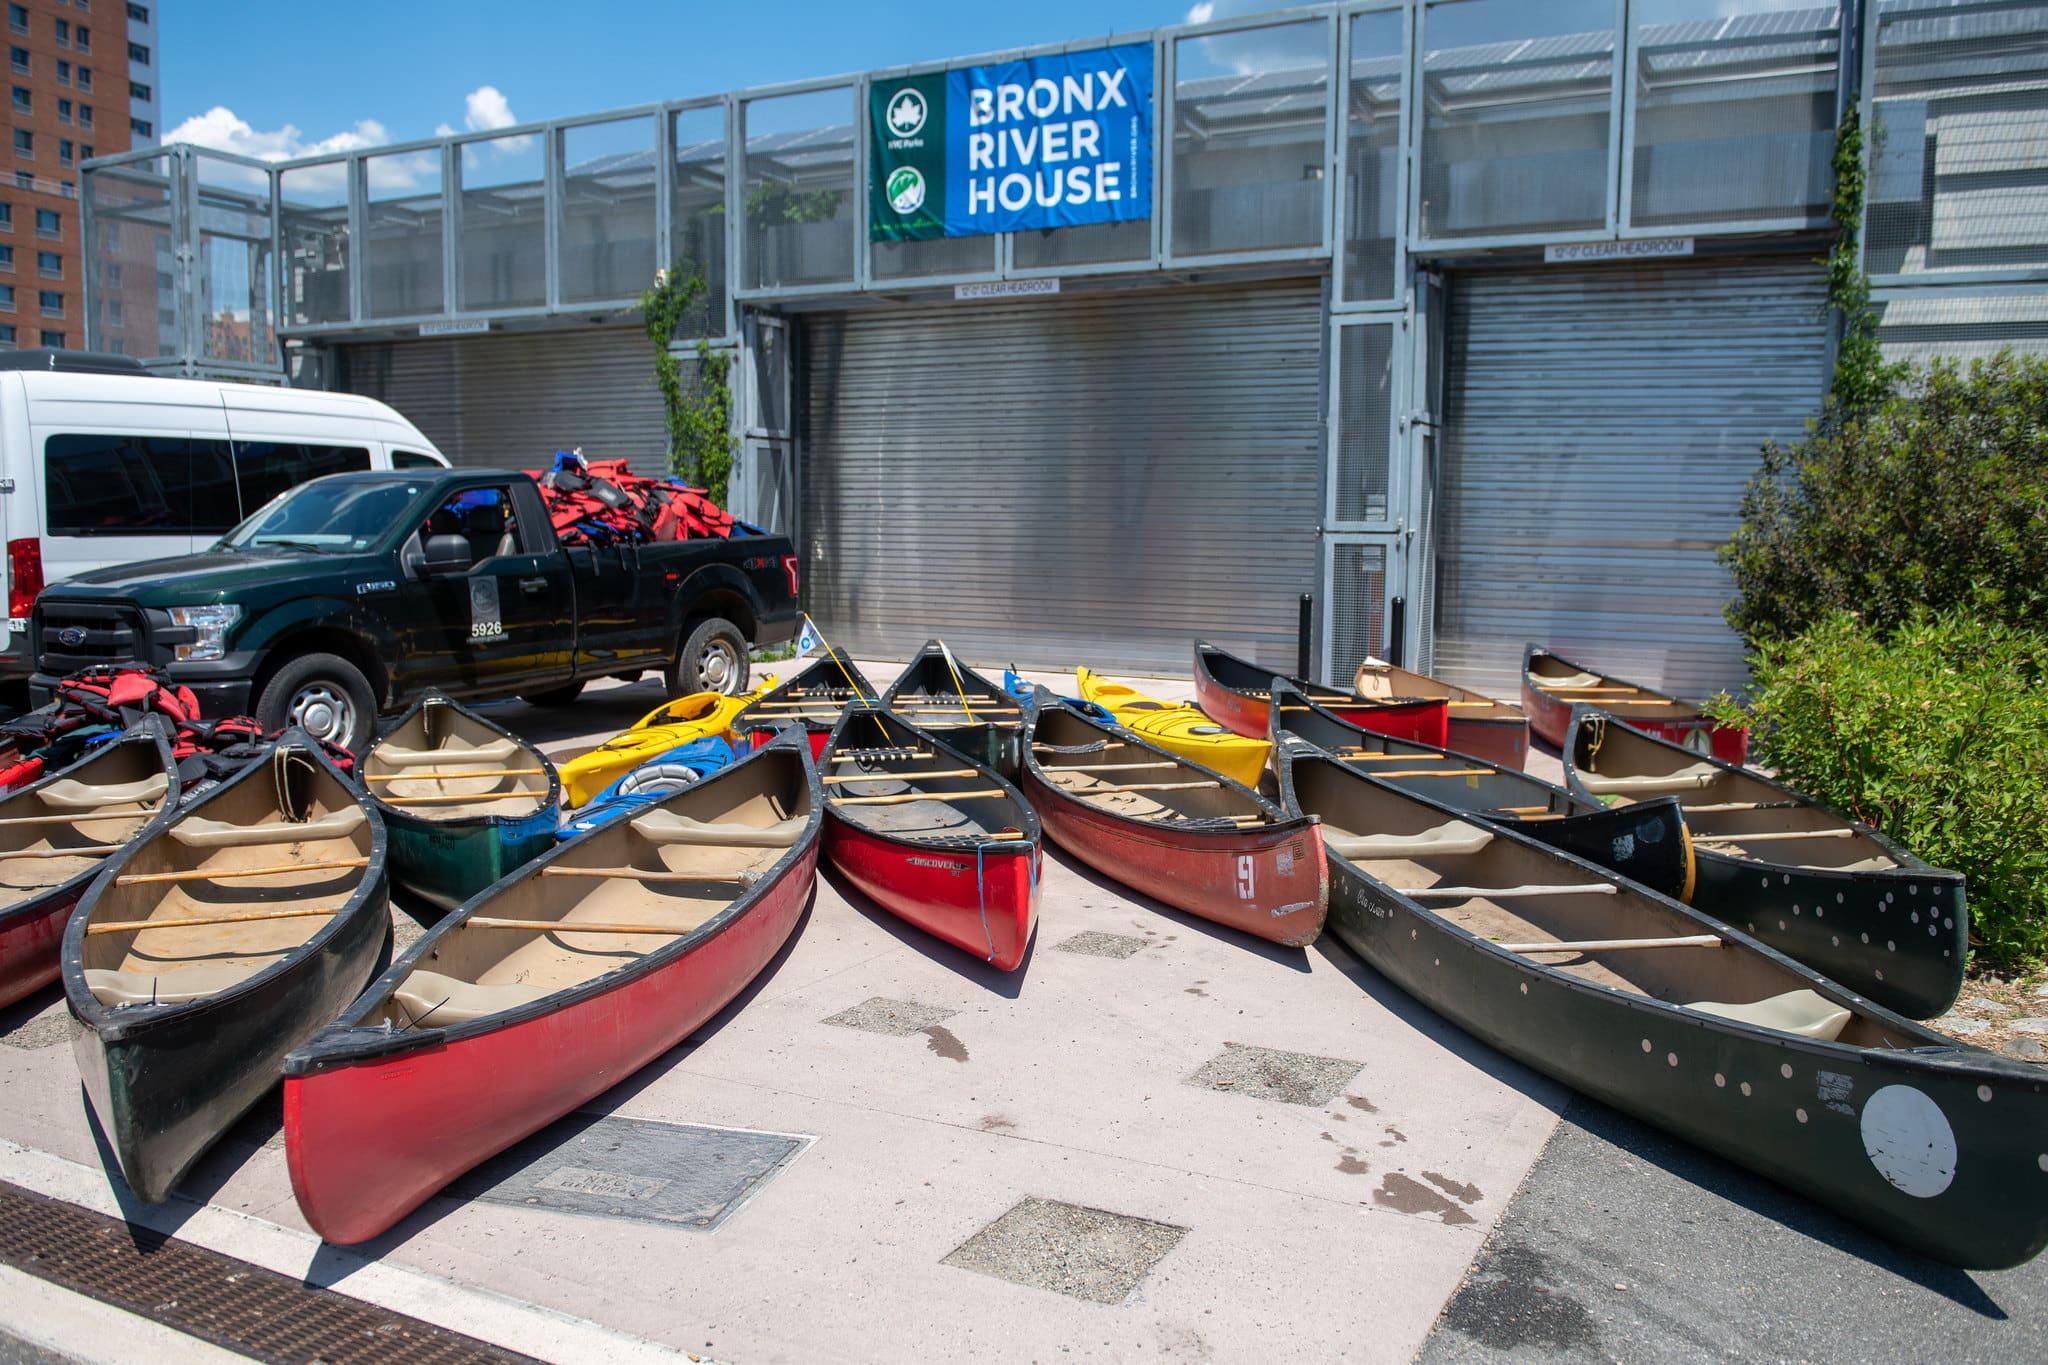 Flotilla-2021-Bronx River House